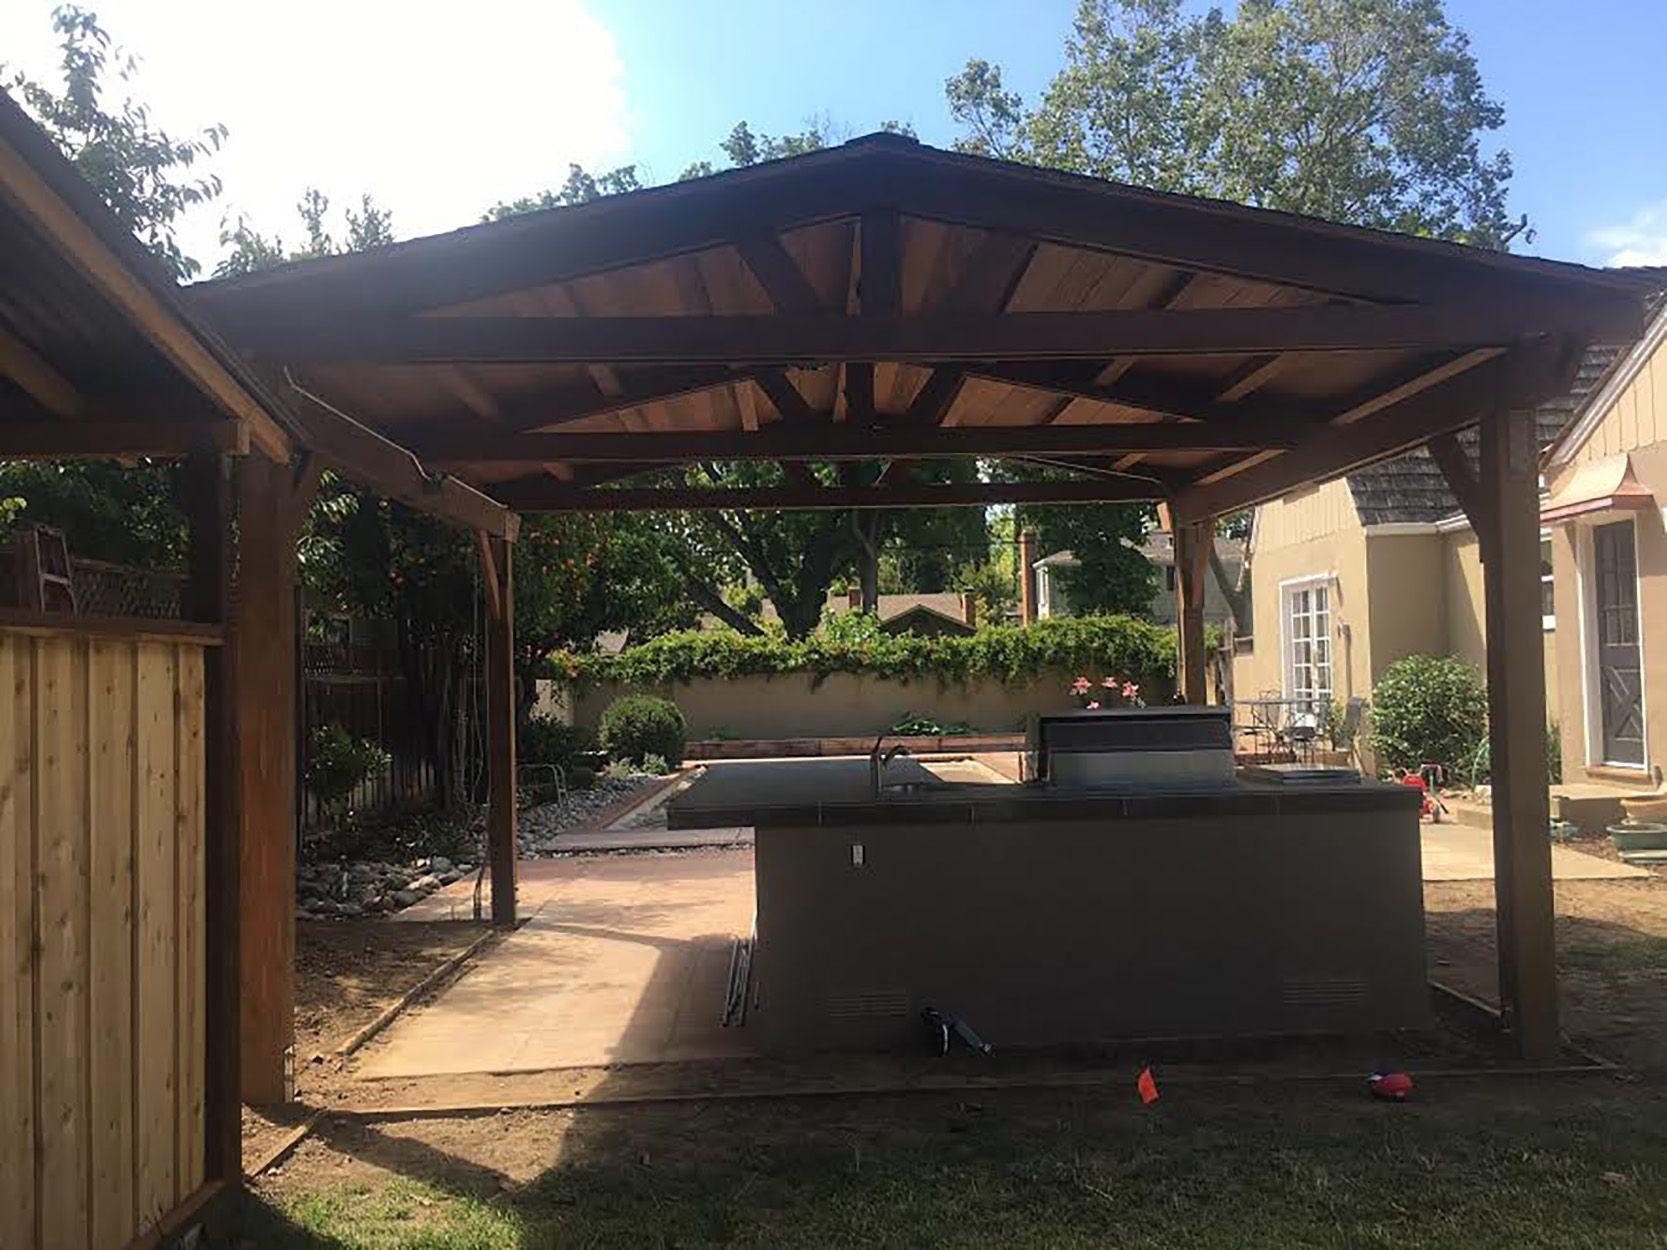 Barbecue Island And Pergola In San Jose Ca Backyard Backyard Paradise Pergola